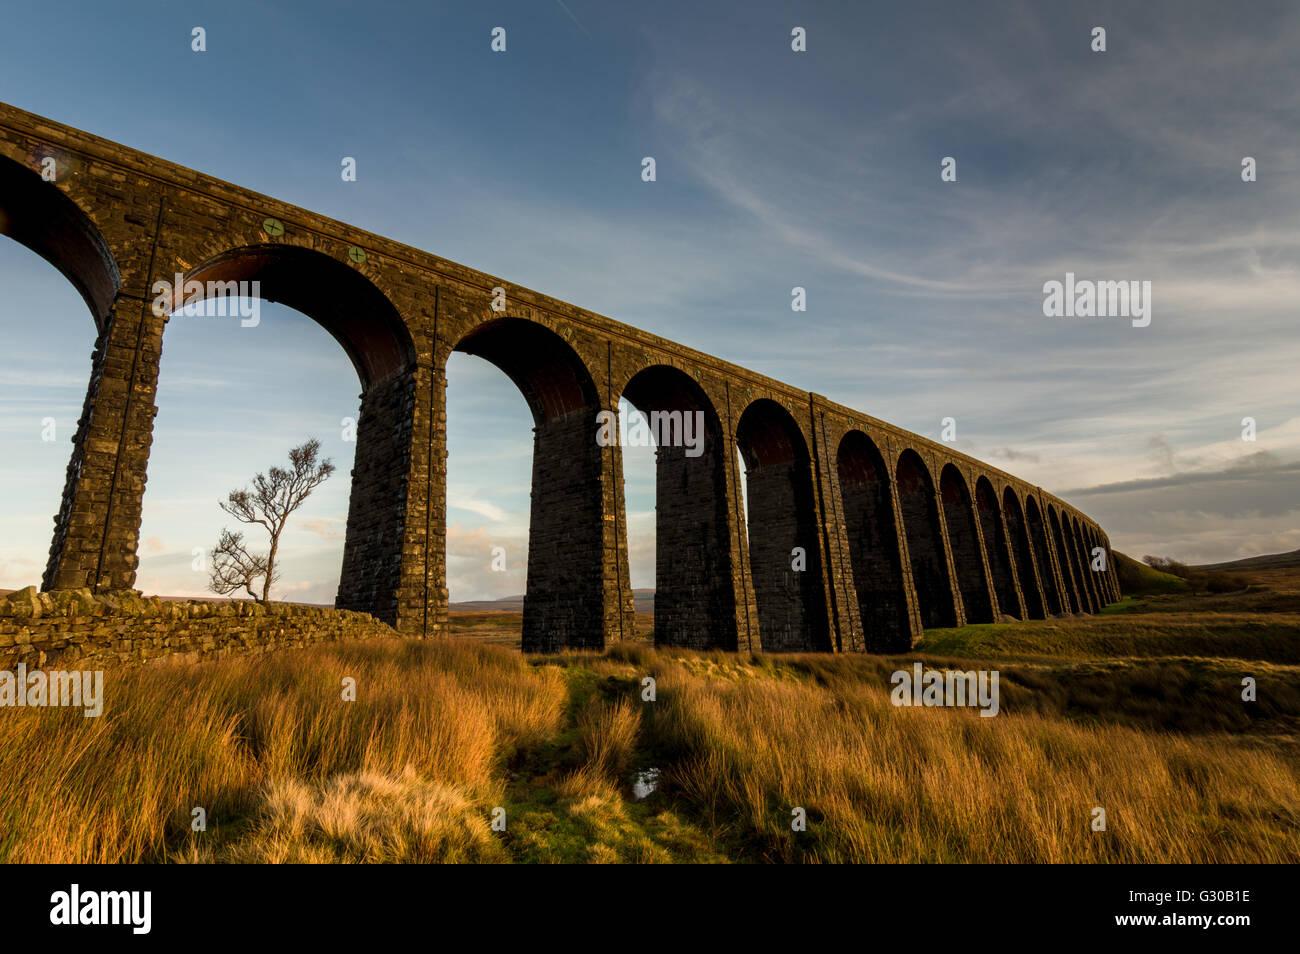 Ribblehead Viaduct, sunset, Yorkshire Dales National Park, Yorkshire, England, United Kingdom, Europe - Stock Image